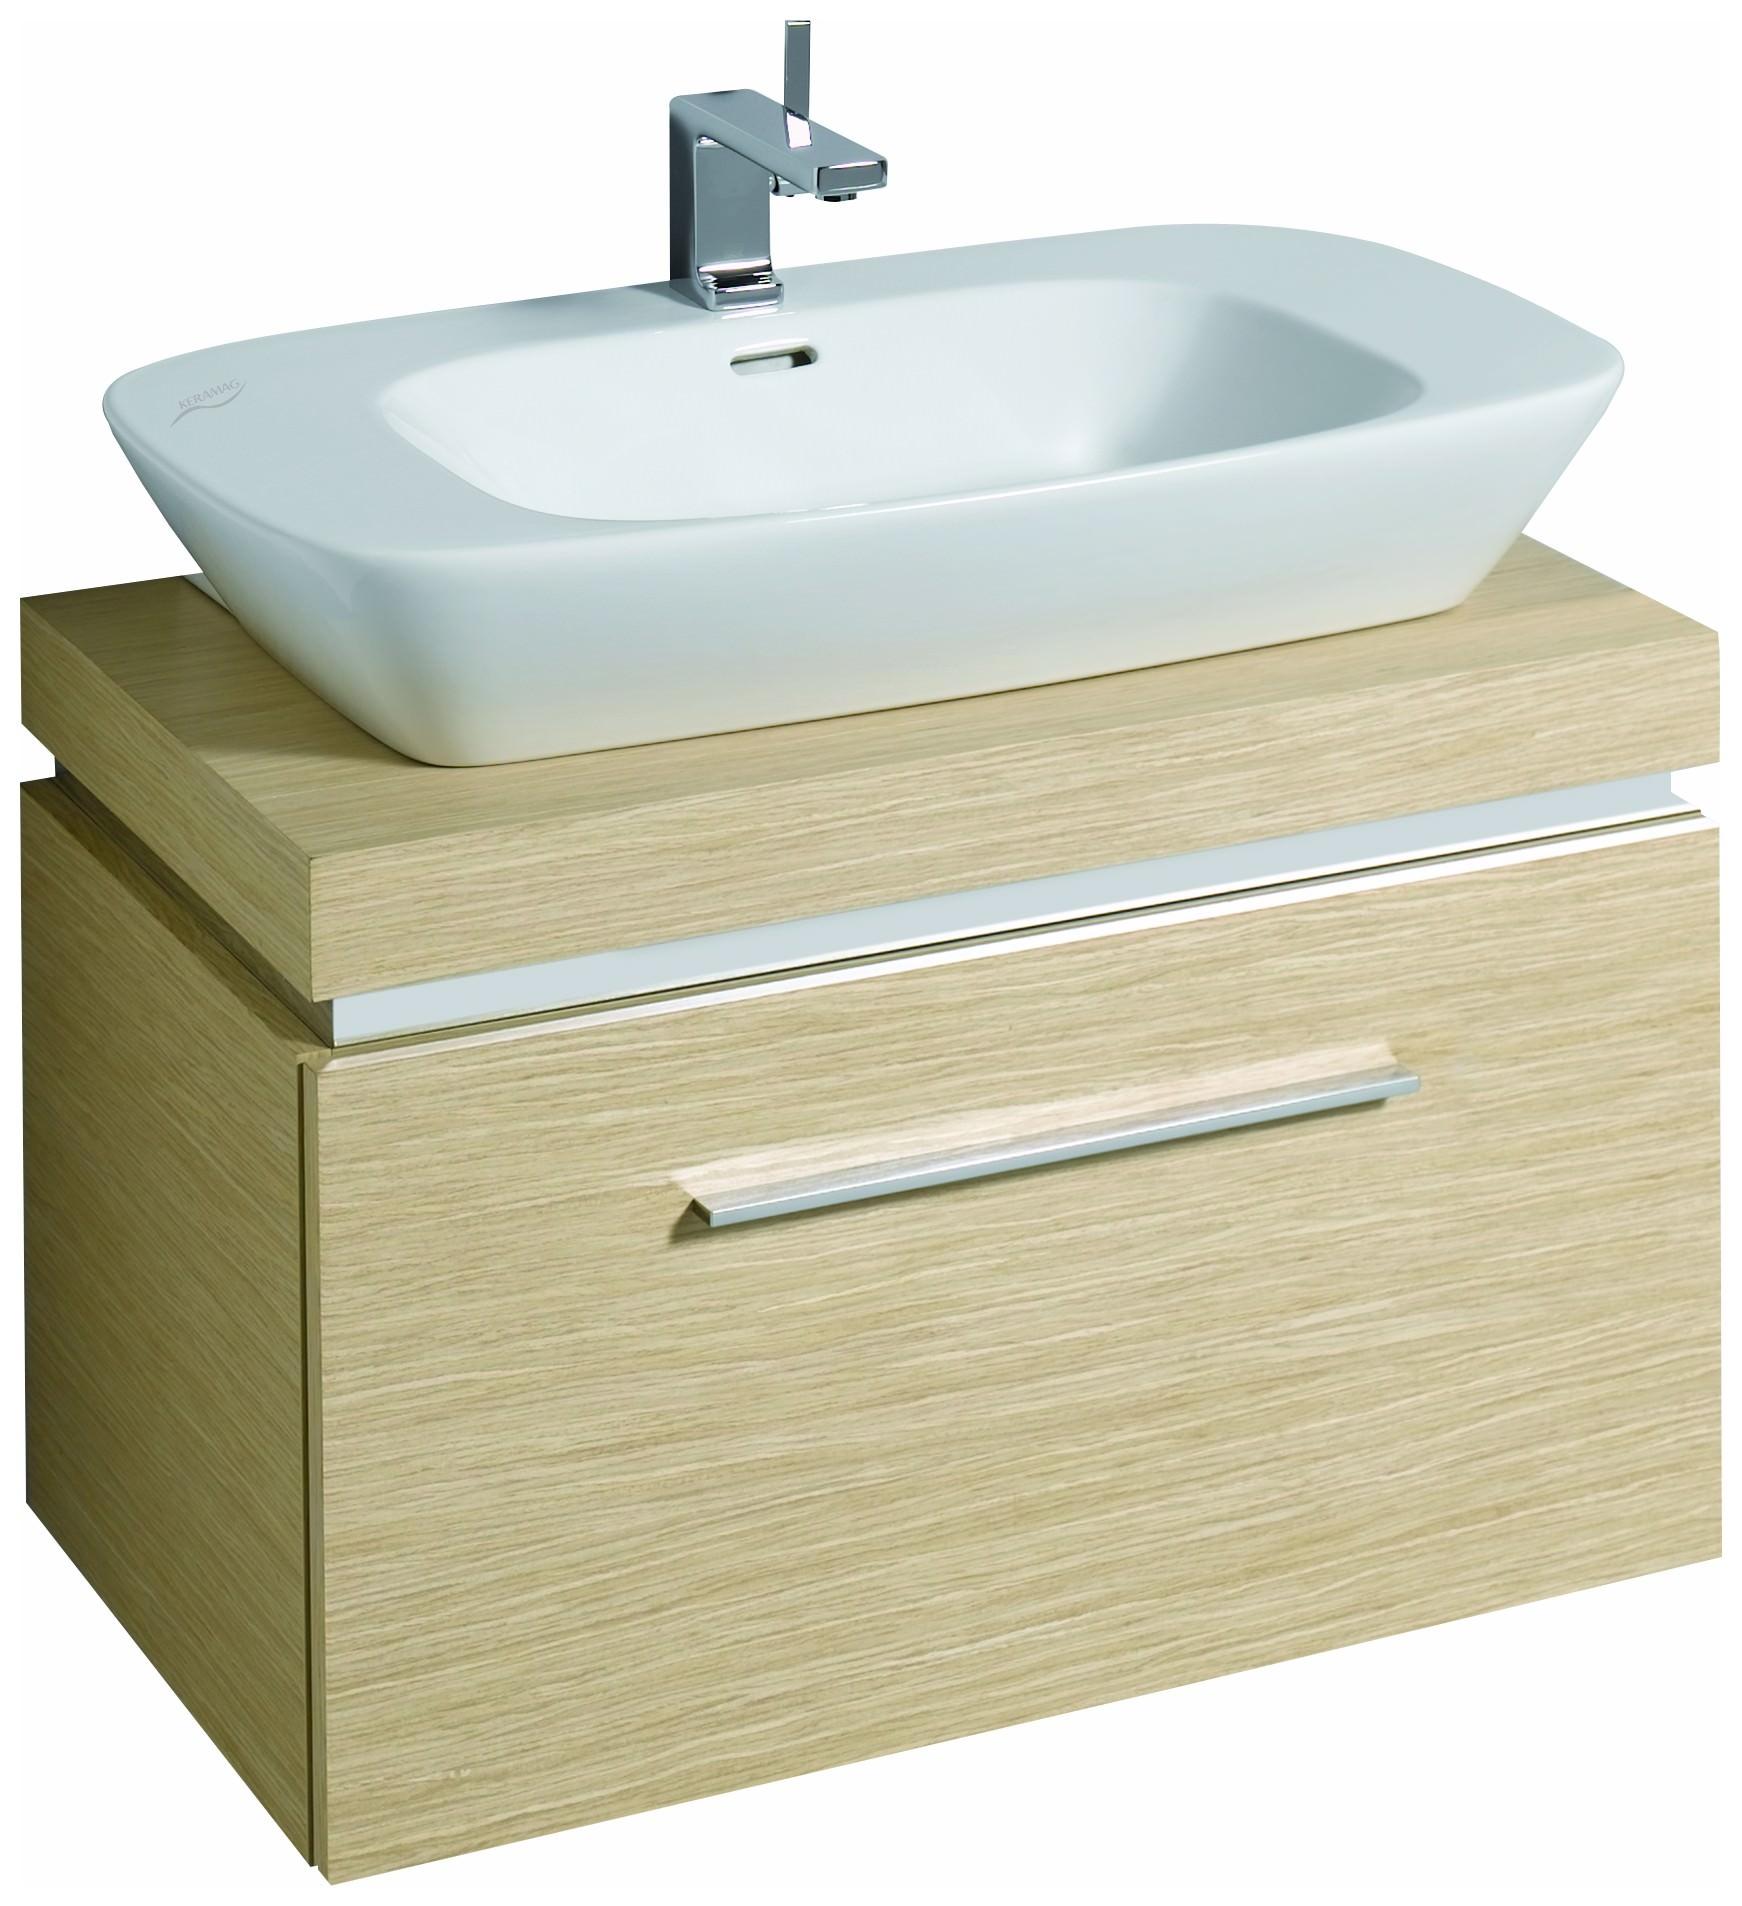 keramag silk waschtisch 800mm x 470mm wei alpin. Black Bedroom Furniture Sets. Home Design Ideas